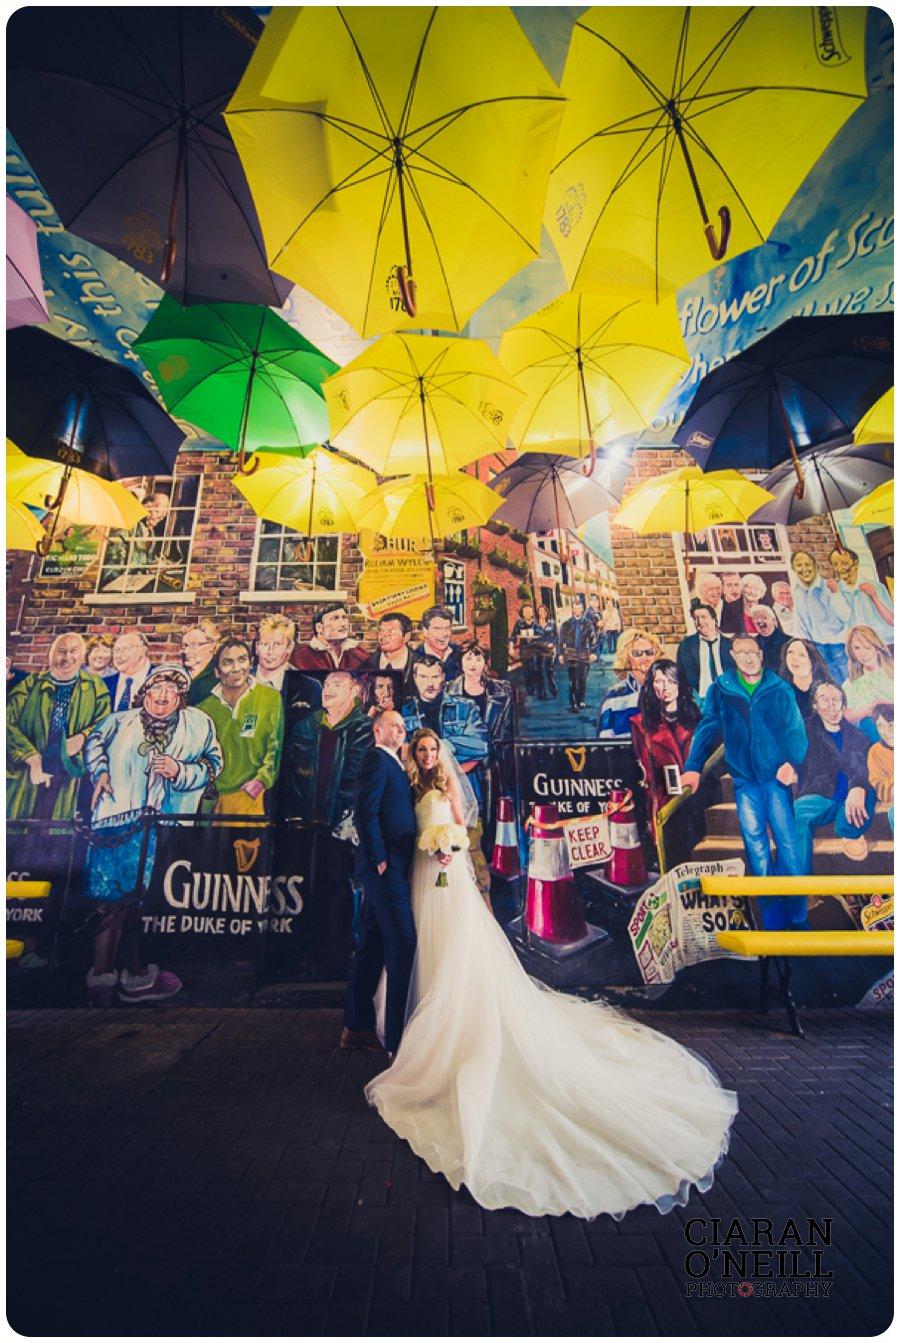 Linda & Jae's wedding at the Merchant Hotel by Ciaran O'Neill Photography 17